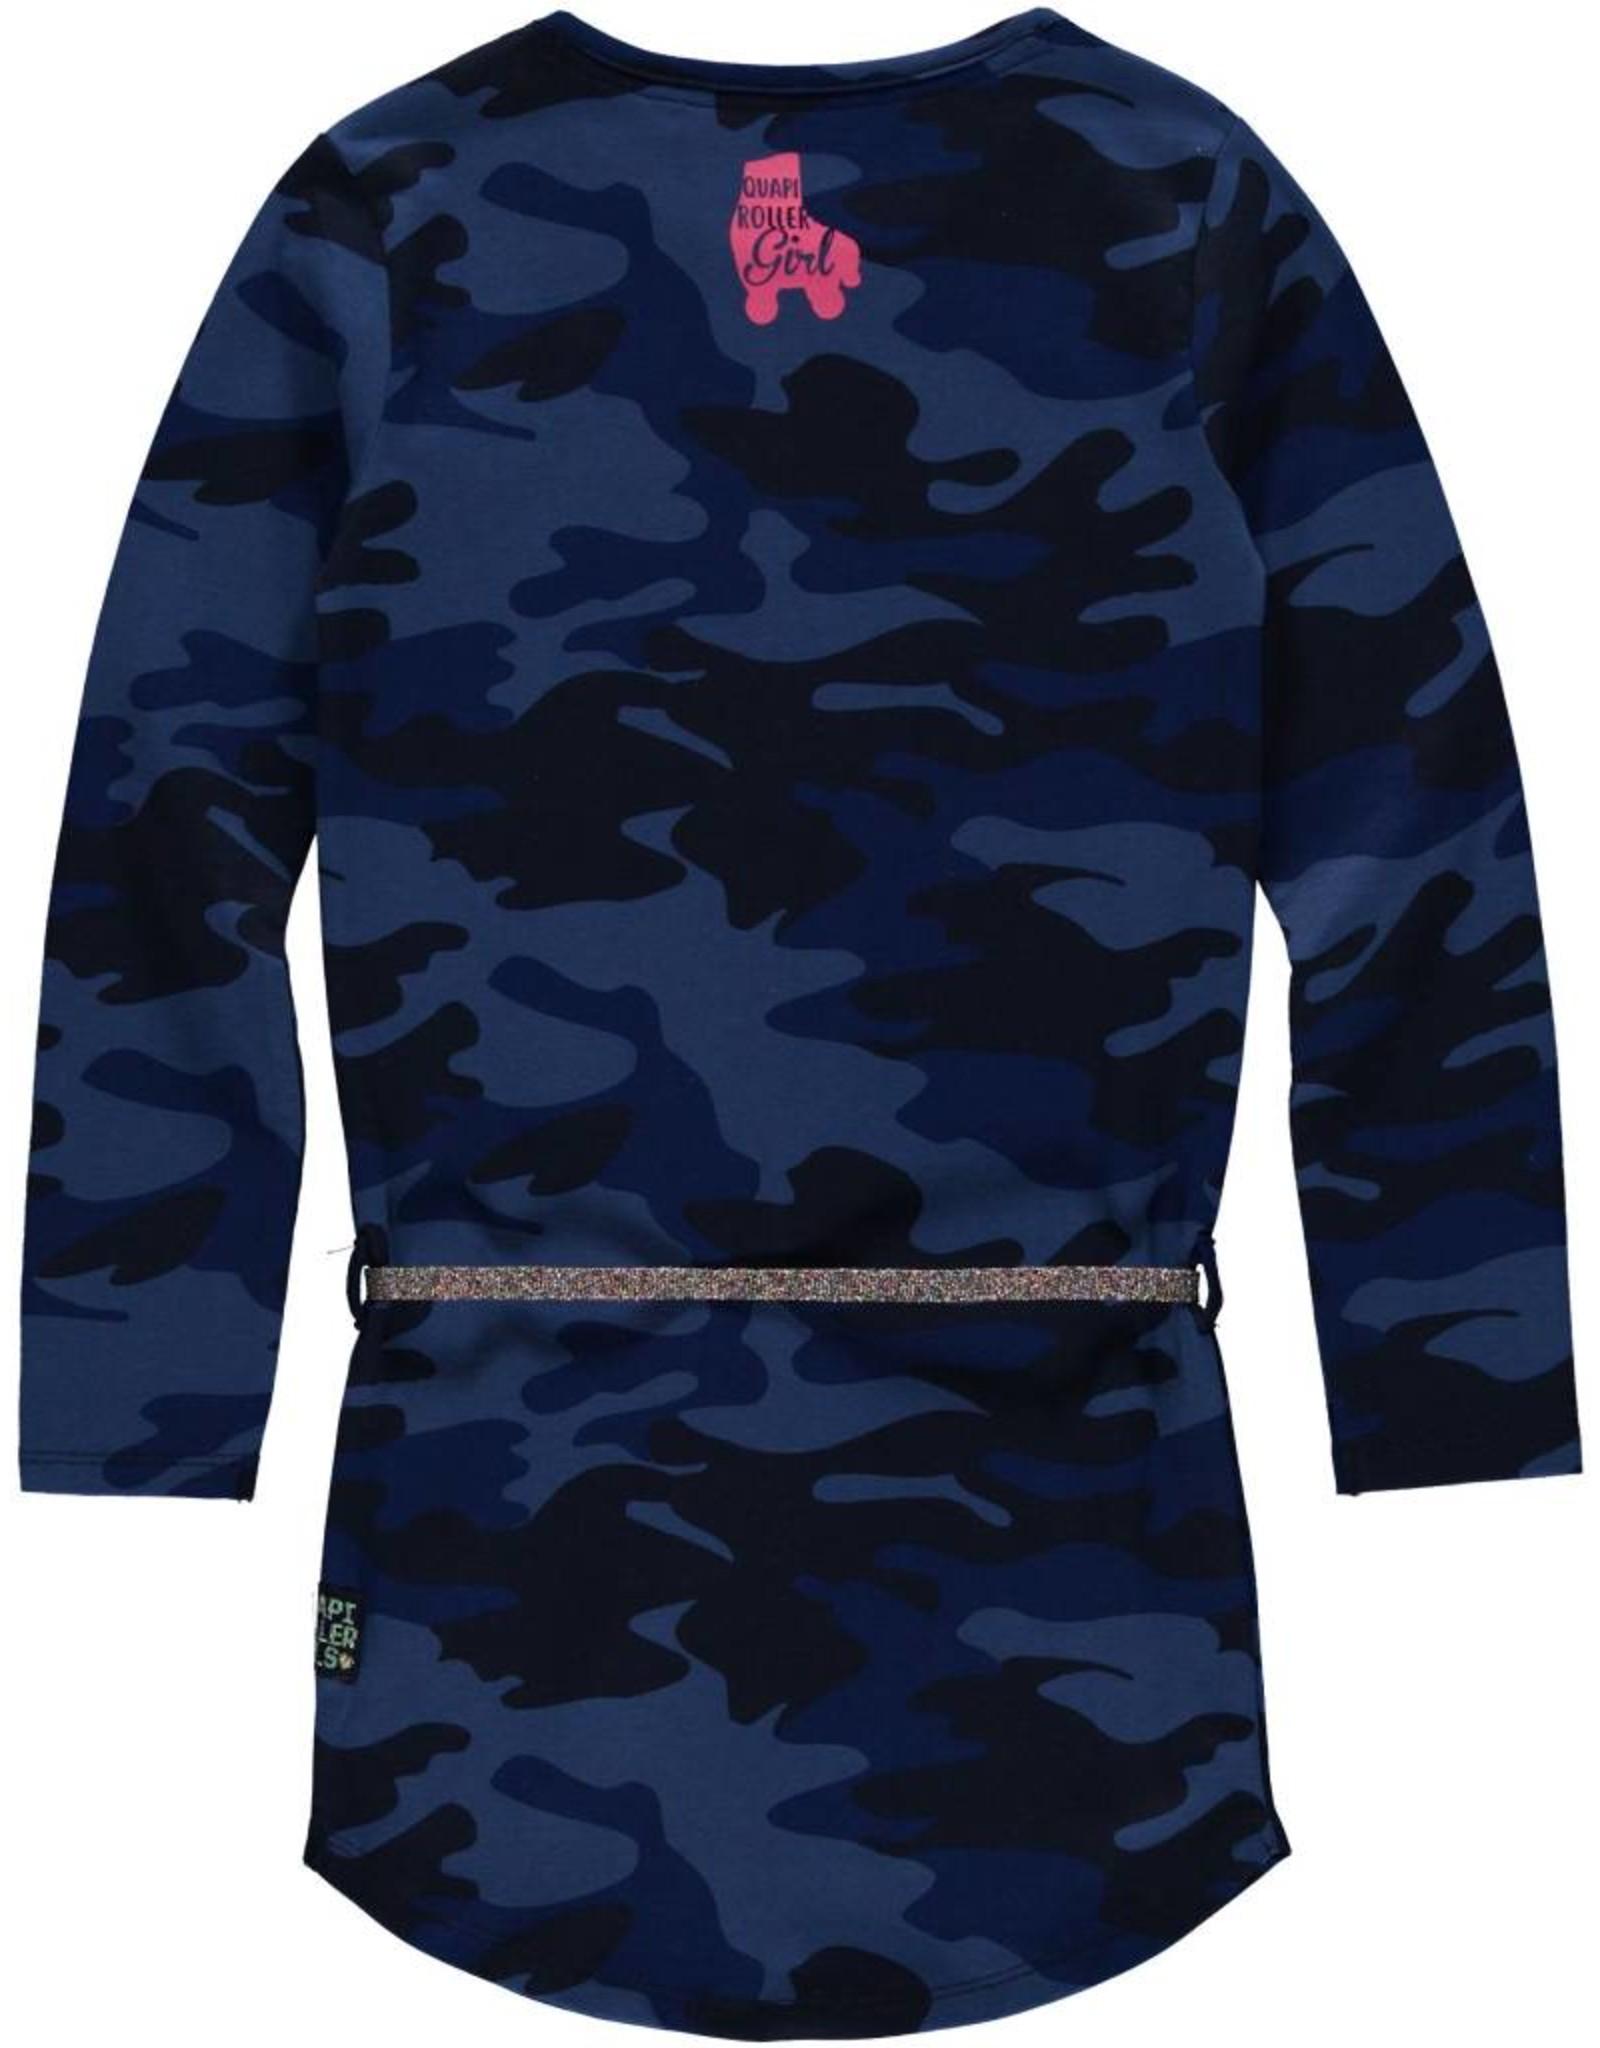 Quapi Quapi meisjes jurk LAMIRA Dark Blue Camouflage